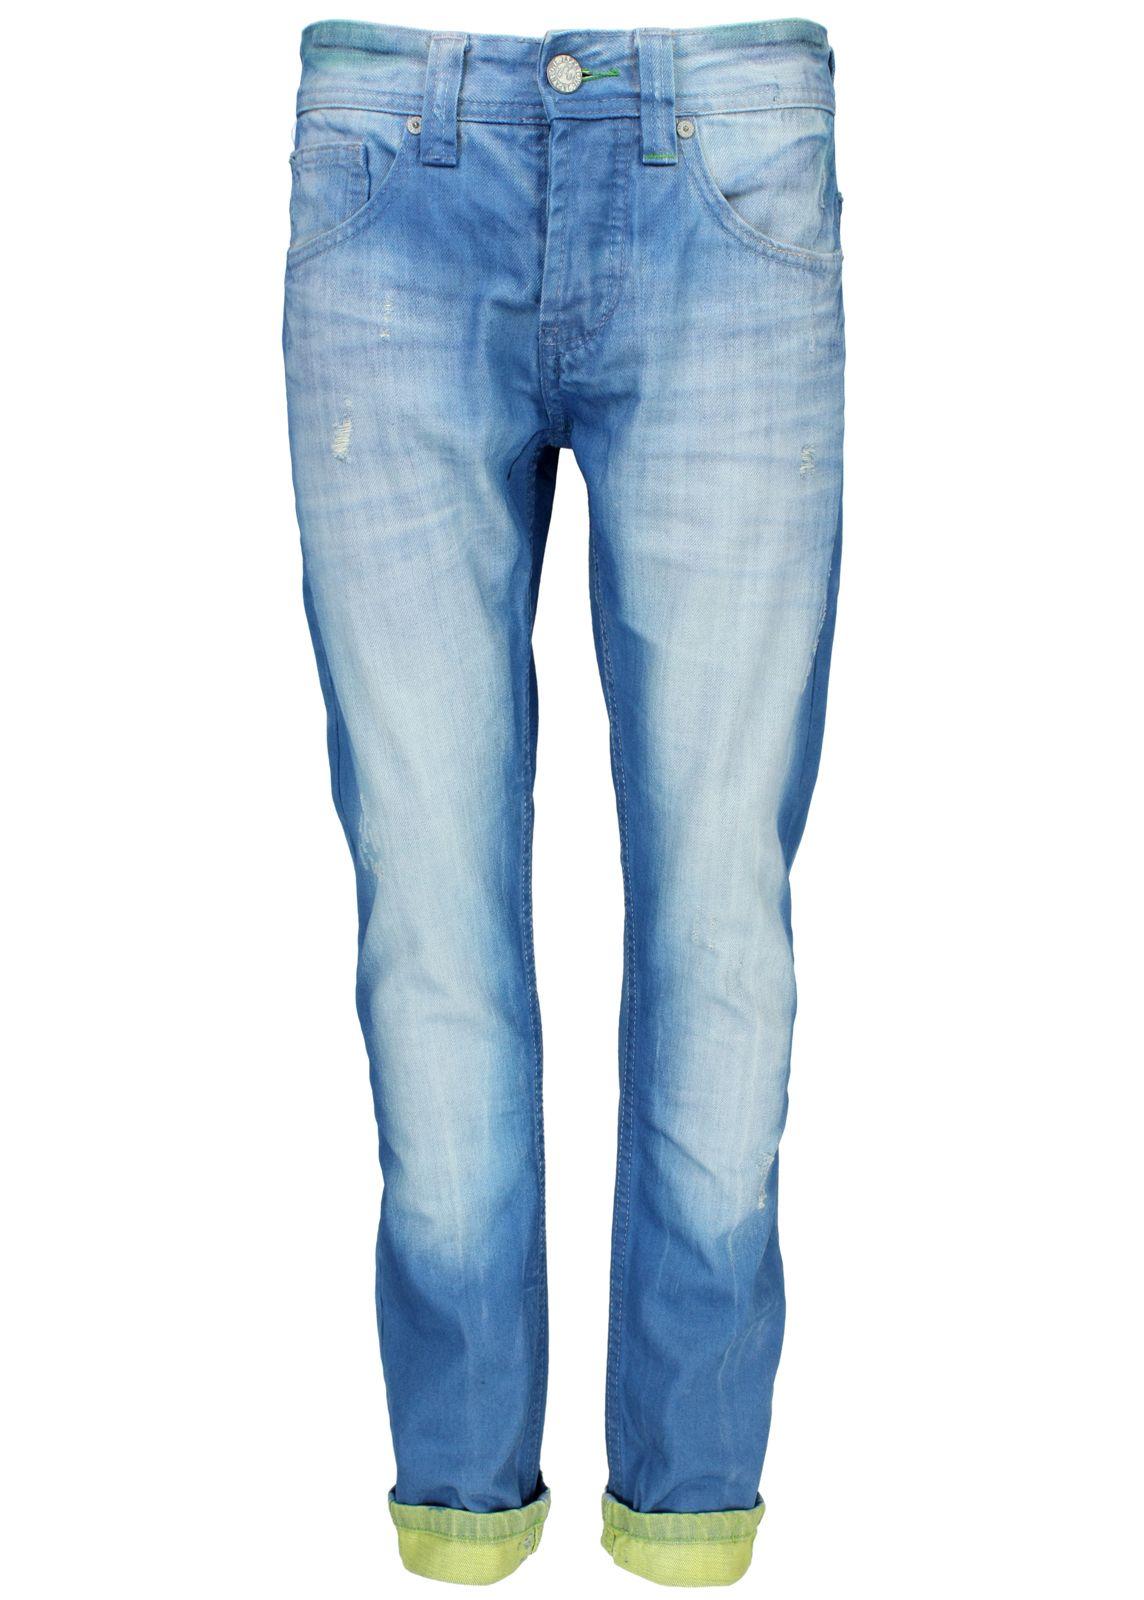 one green elephant jeans chico blue green fettebeute online shop. Black Bedroom Furniture Sets. Home Design Ideas